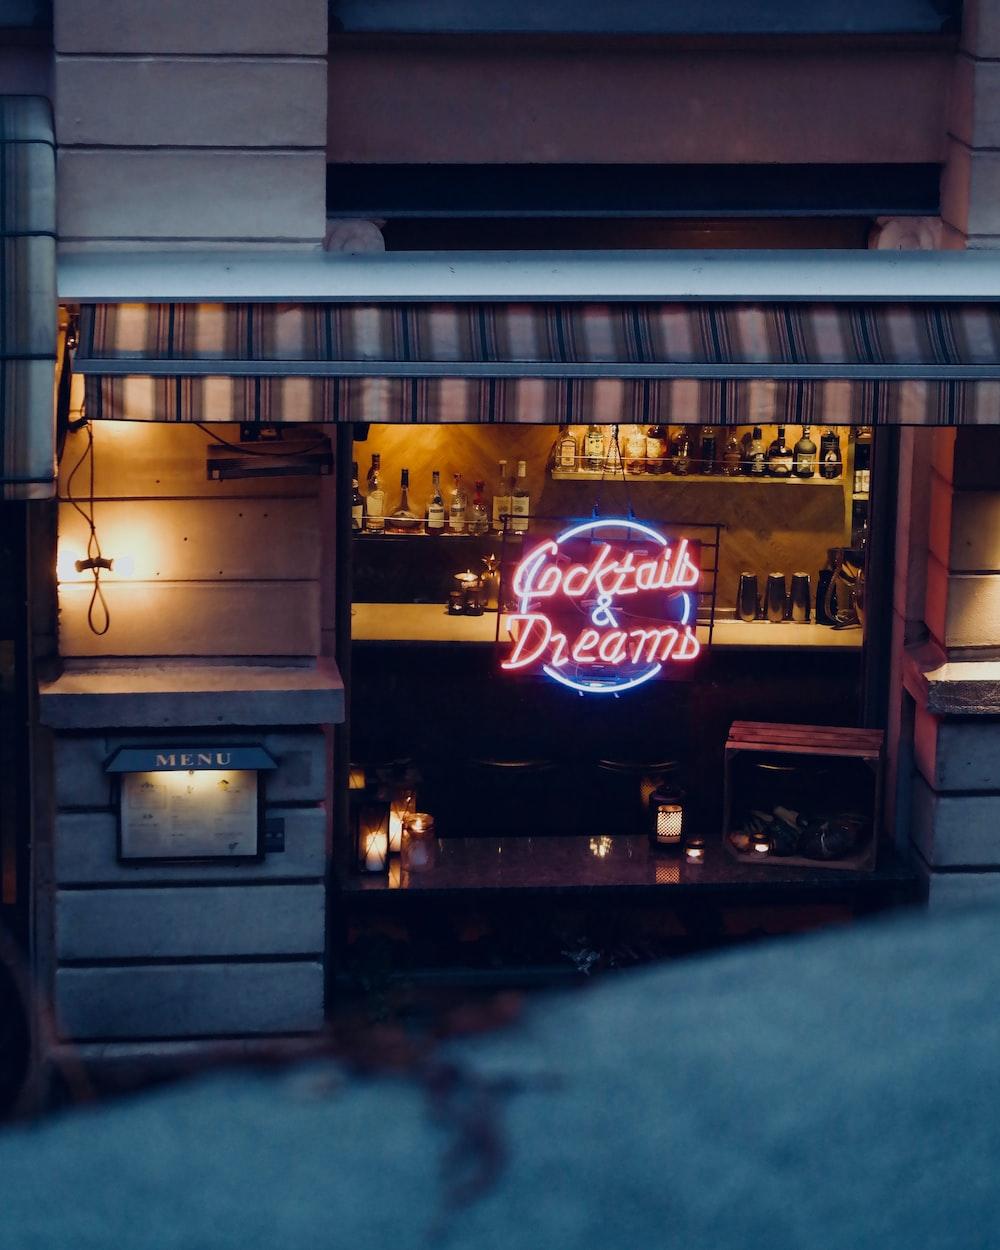 Cocktails & Dreams neon signage